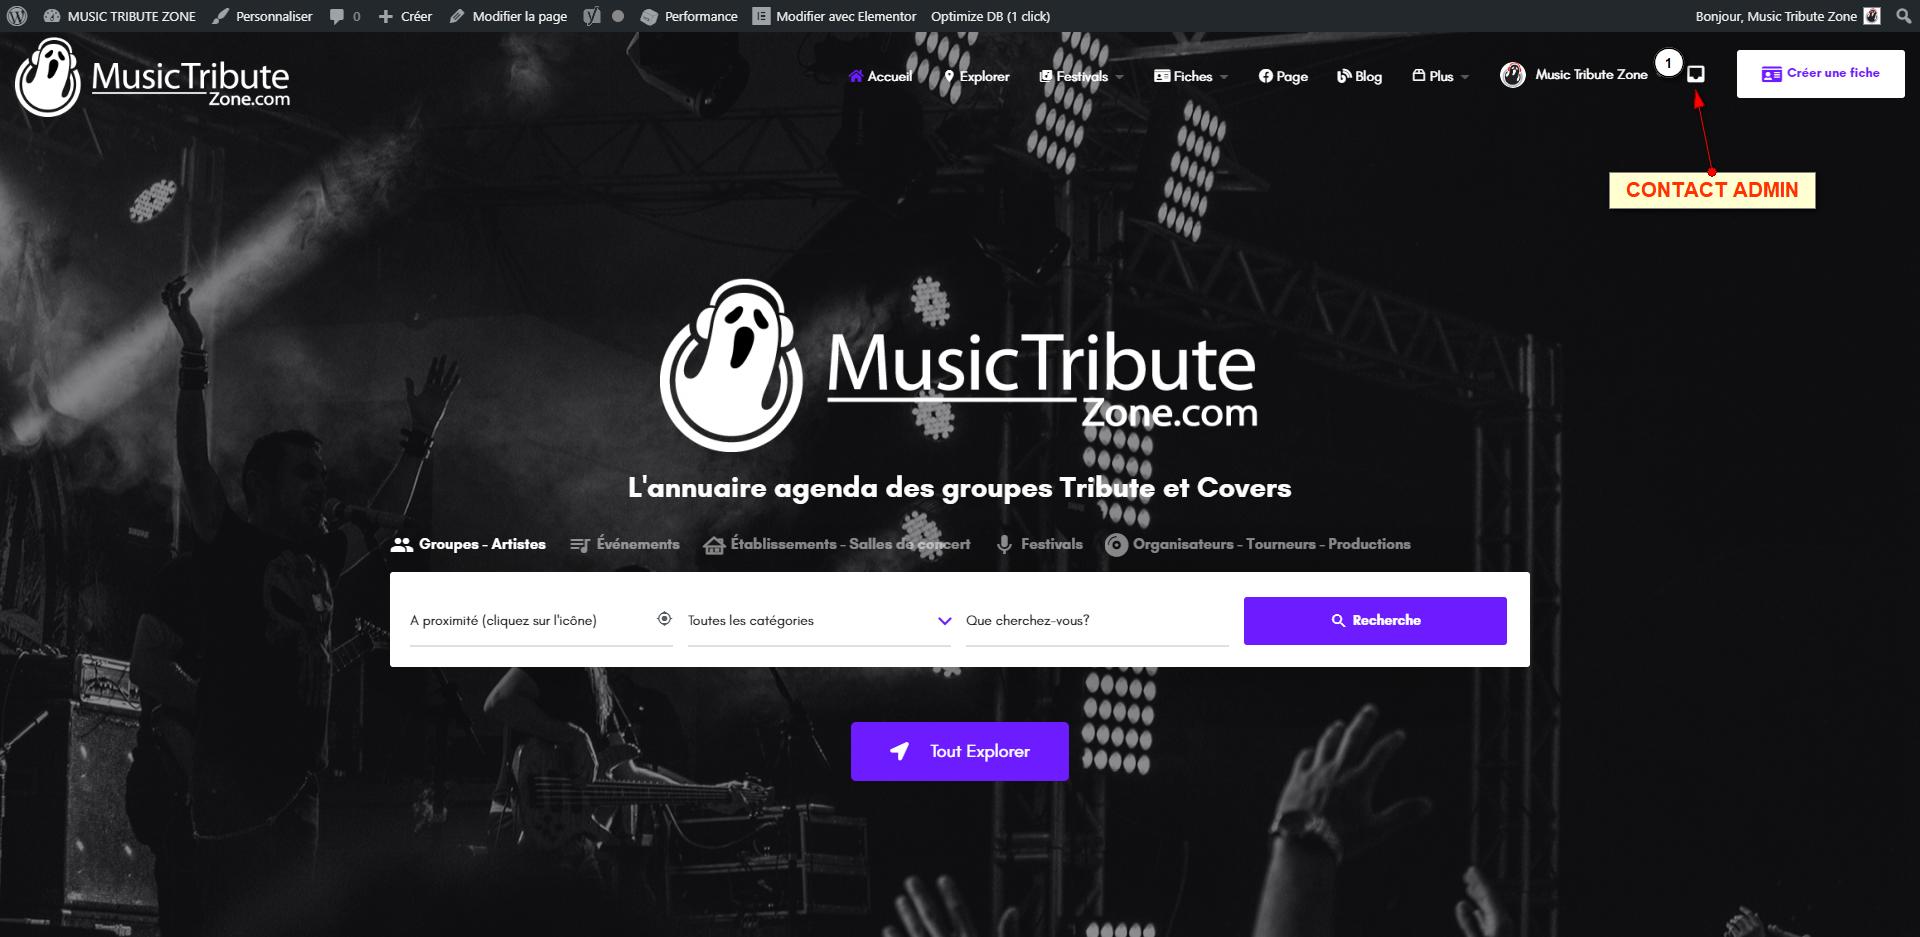 FireShot Pro Screen Capture #015 - 'MUSIC TRIBUTE ZONE I Répertoire Tribute & Covers' - music-tribute-zone_com